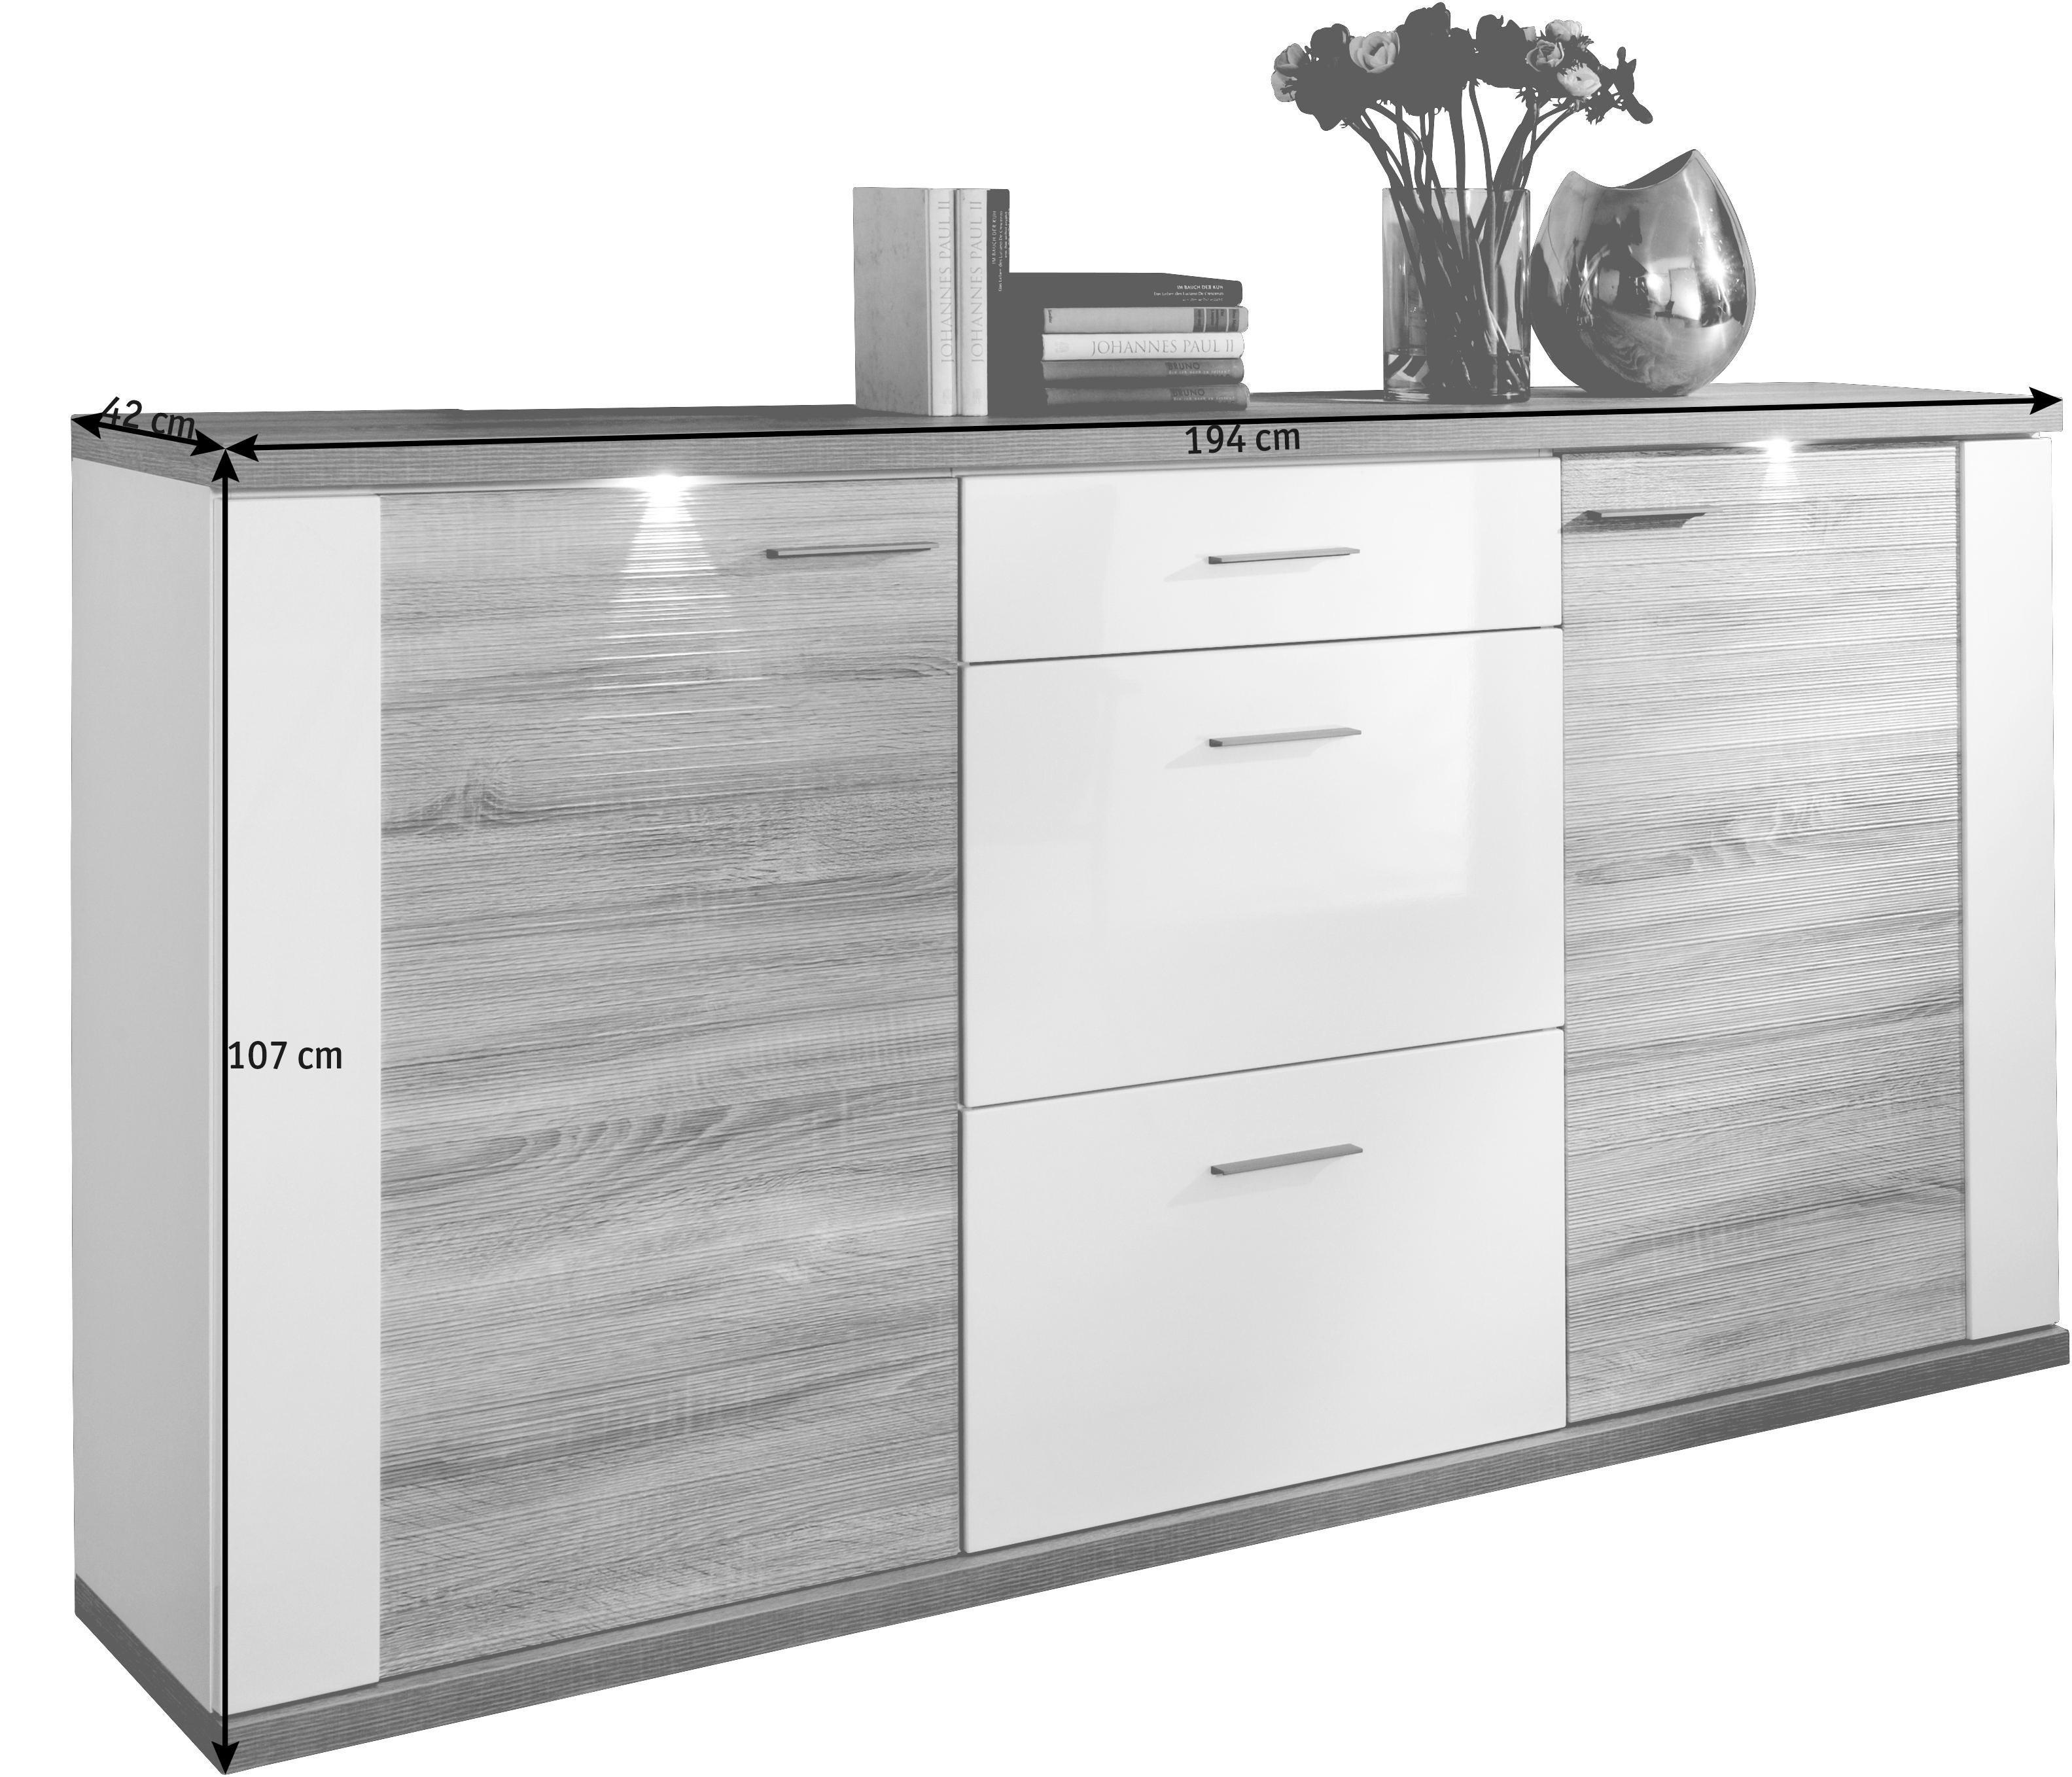 Sideboard Chromfarben Eichefarben Design Holzwerkstoff Kunststoff Xora?upscaleu003dpaddu0026wu003d520u0026hu003d470u0026qltu003d90